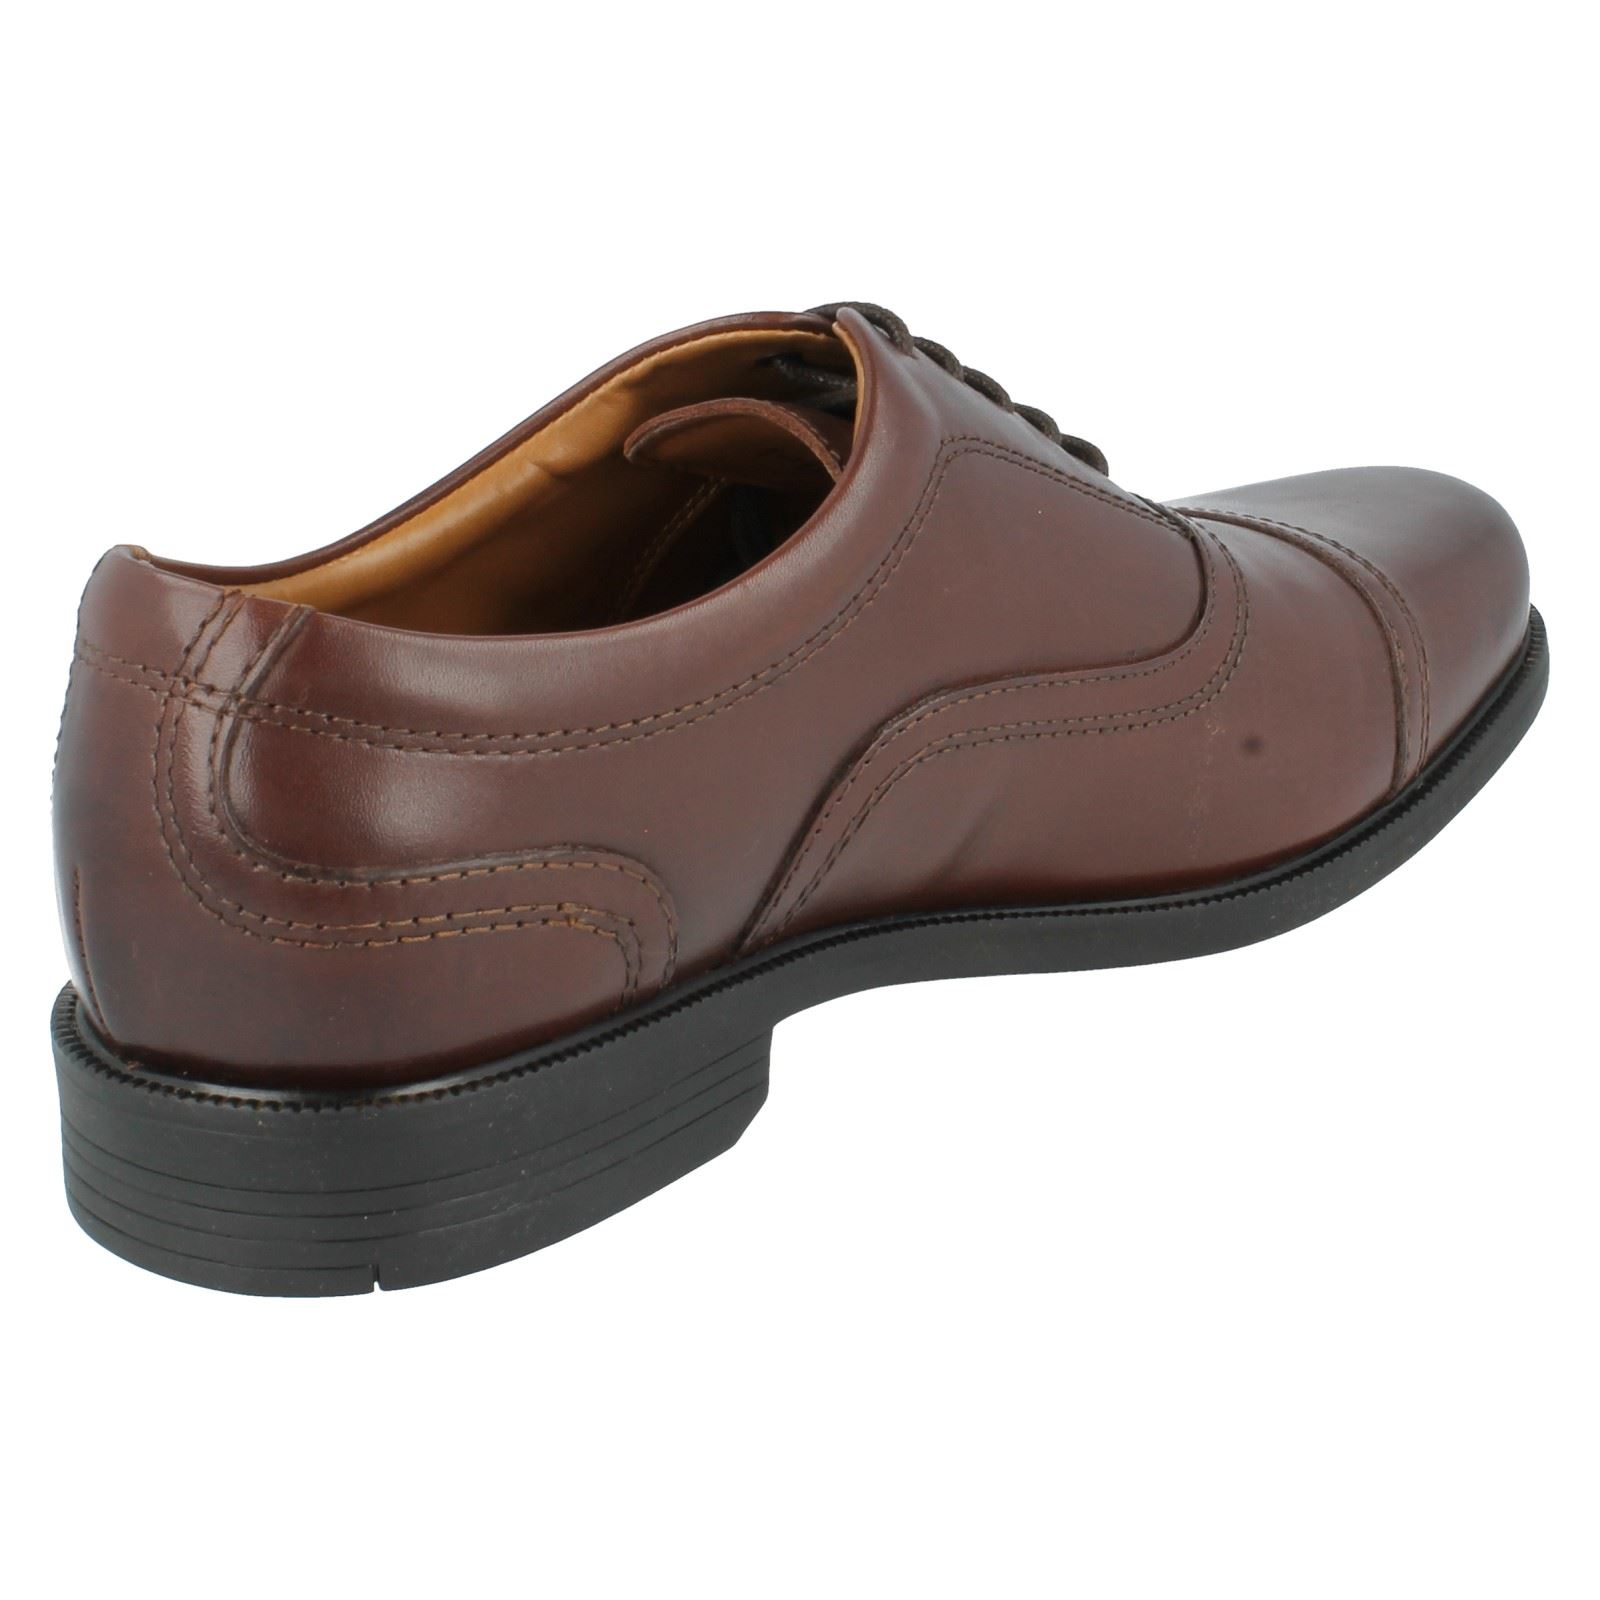 Men's Clarks Schuhes Schuhes Clarks  Beeston Cap a1b848